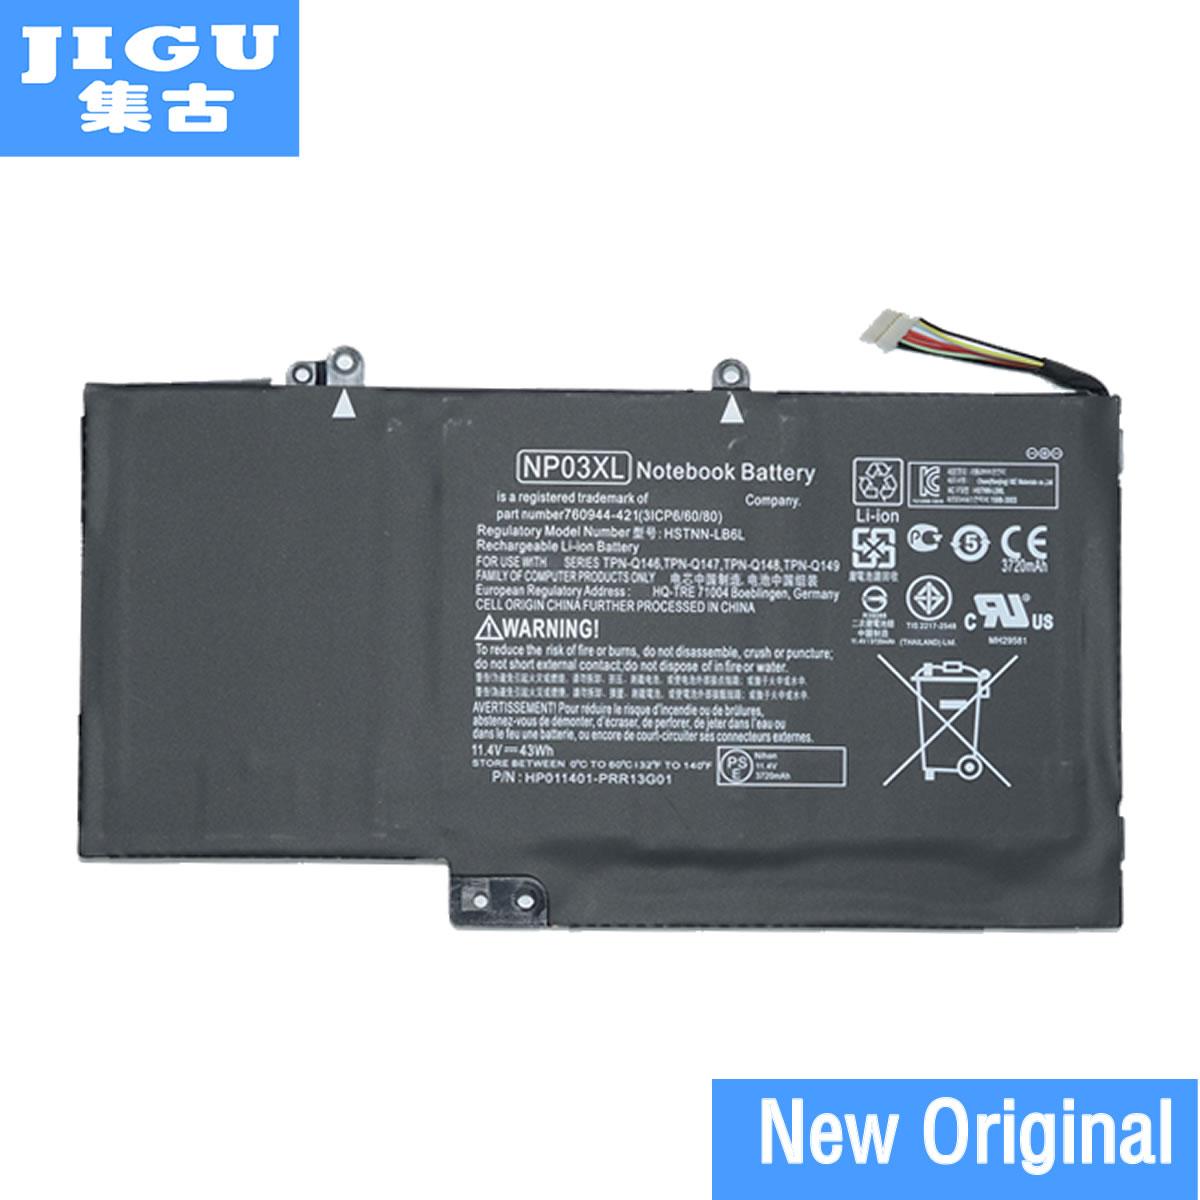 JIGU Original NP03XL batería para HP Pavilion X360 13-A010DX 13-b116t envidia para 15-U010DX 15-U050CA HSTNN-LB6L 760944-421 43Wh